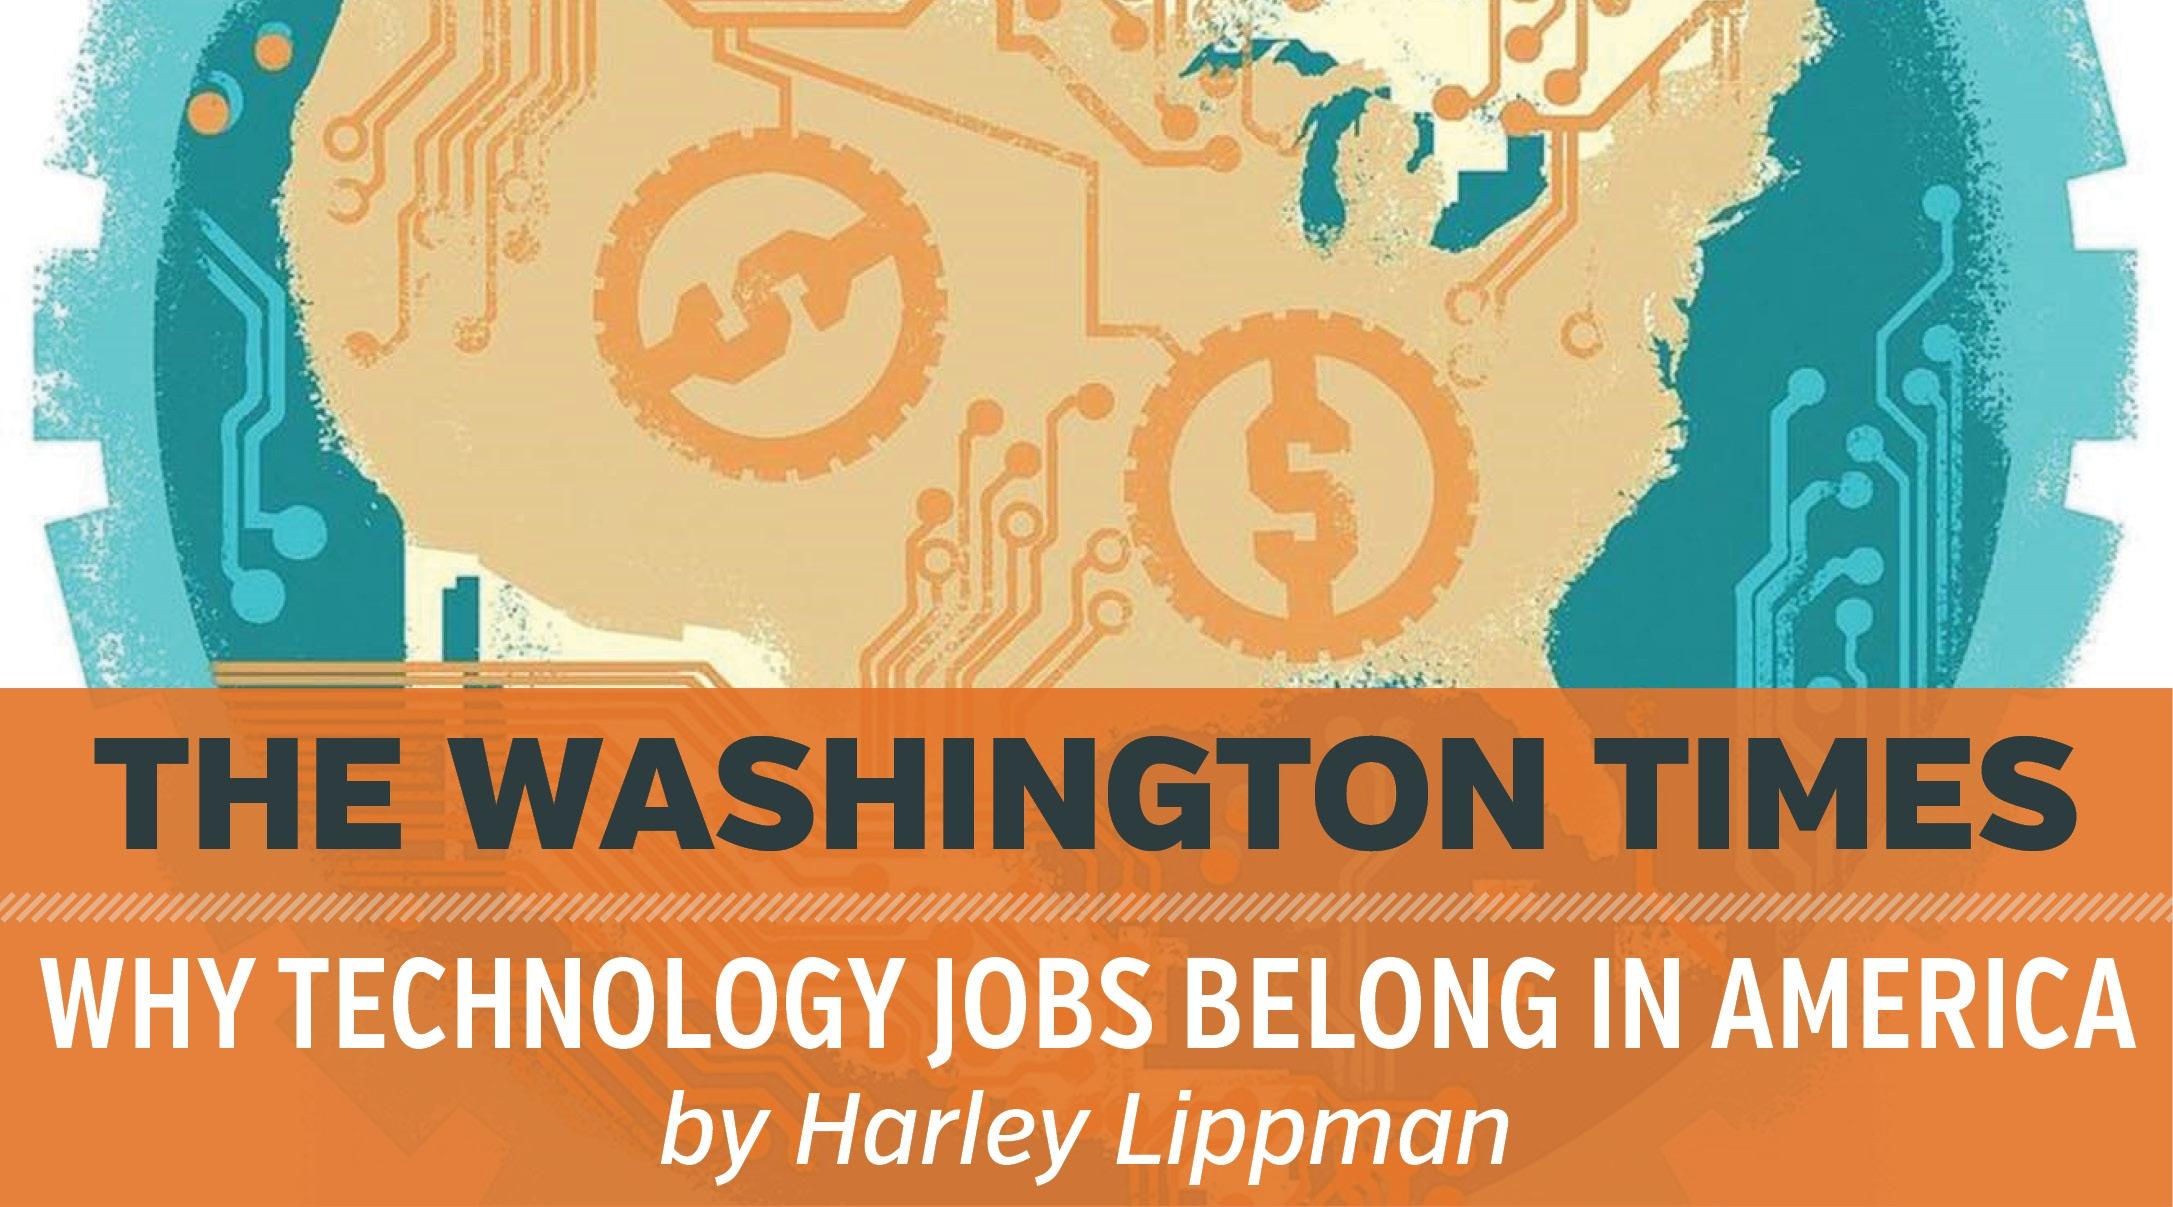 Why Technology Jobs Belong in America  - The Washington Times, Genesis10